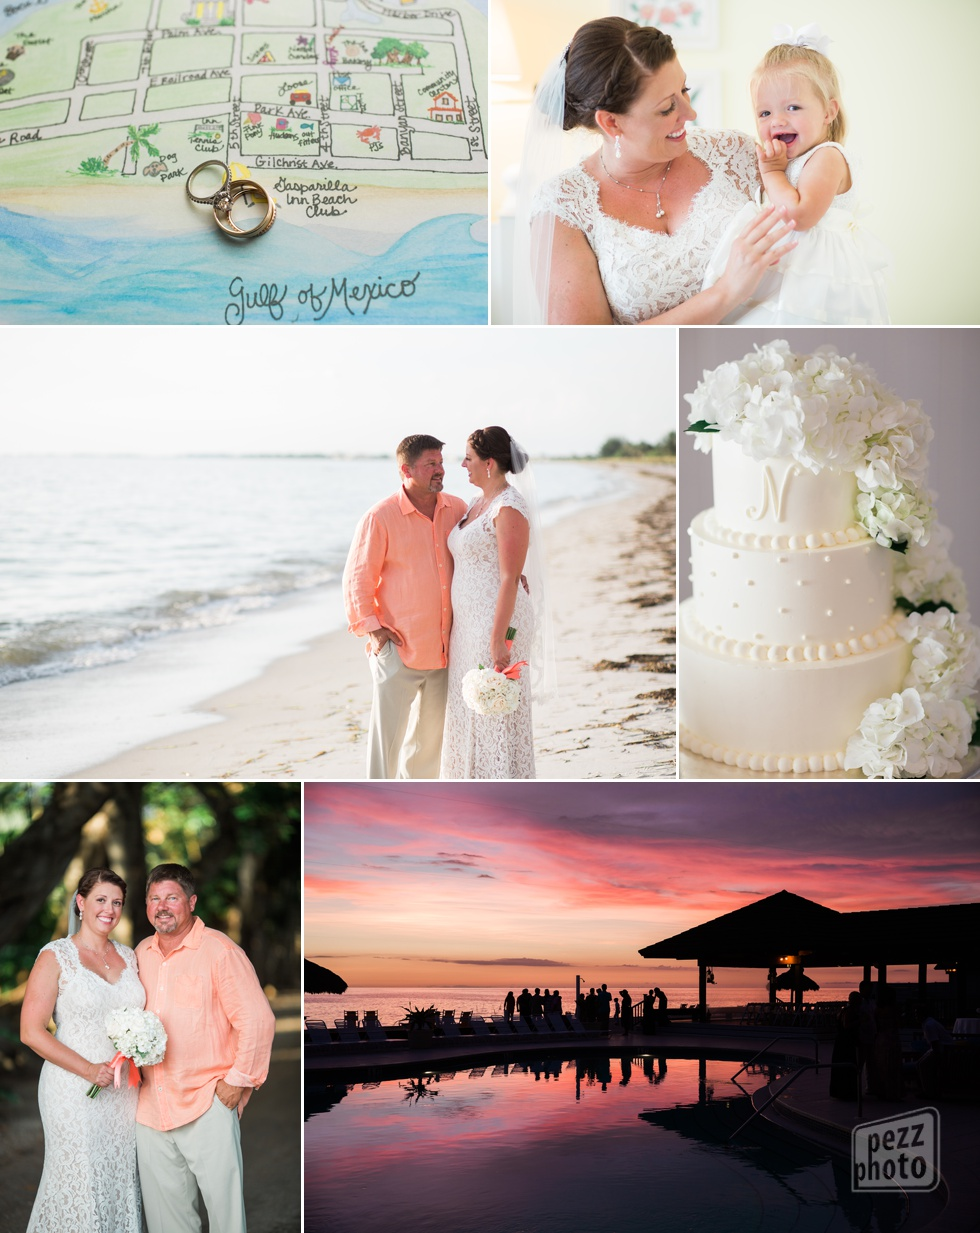 Jenkins_wedding_gasparilla_pezzphoto